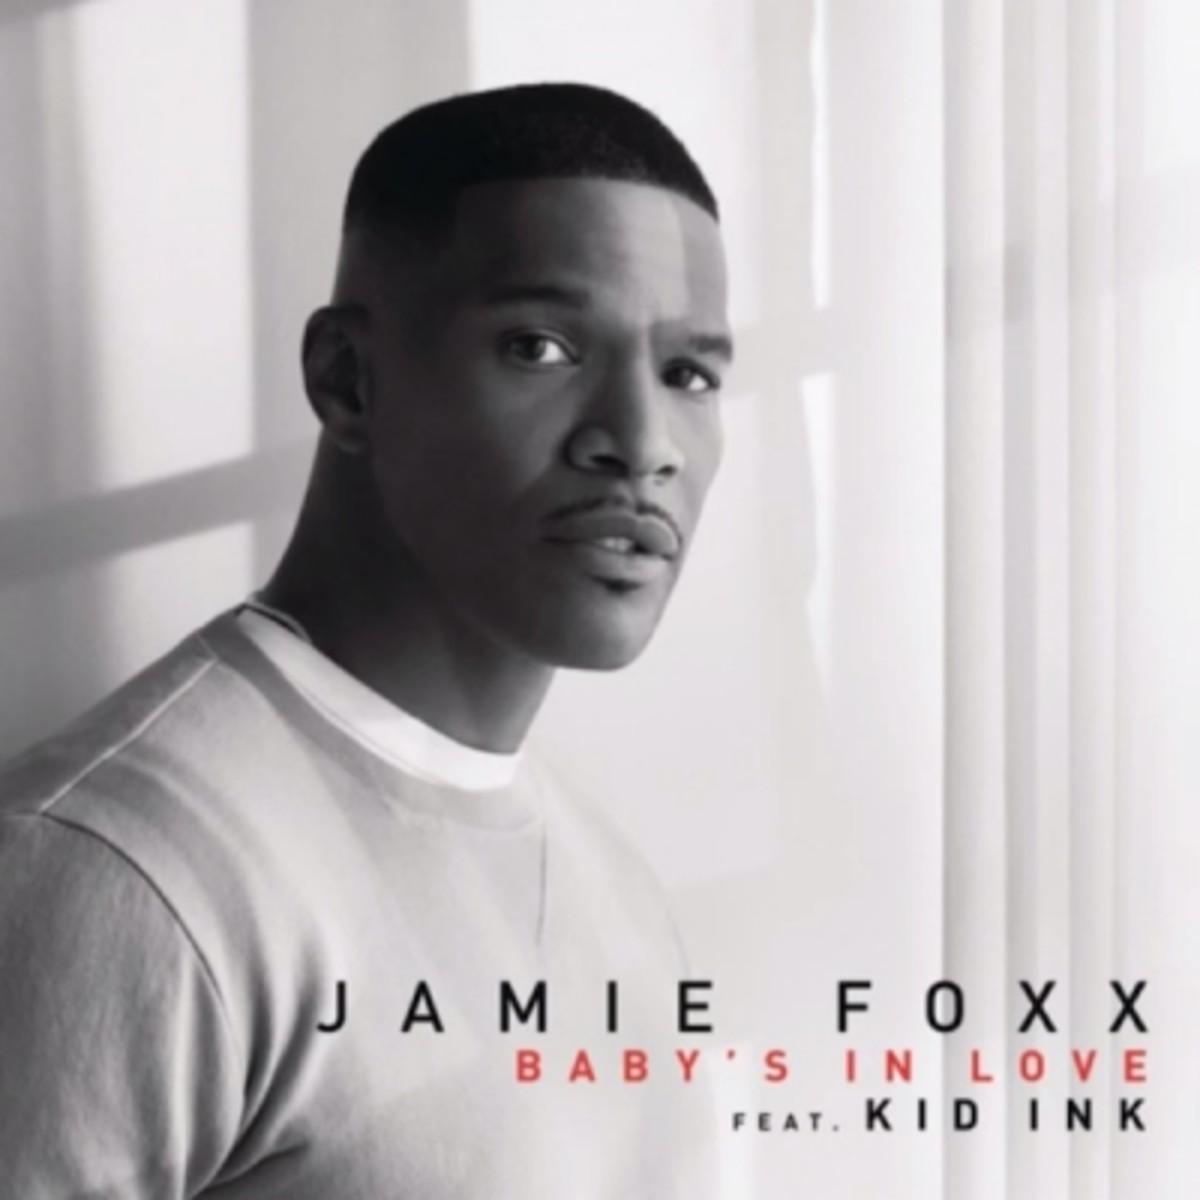 jamie-foxx-babys-in-love.jpg